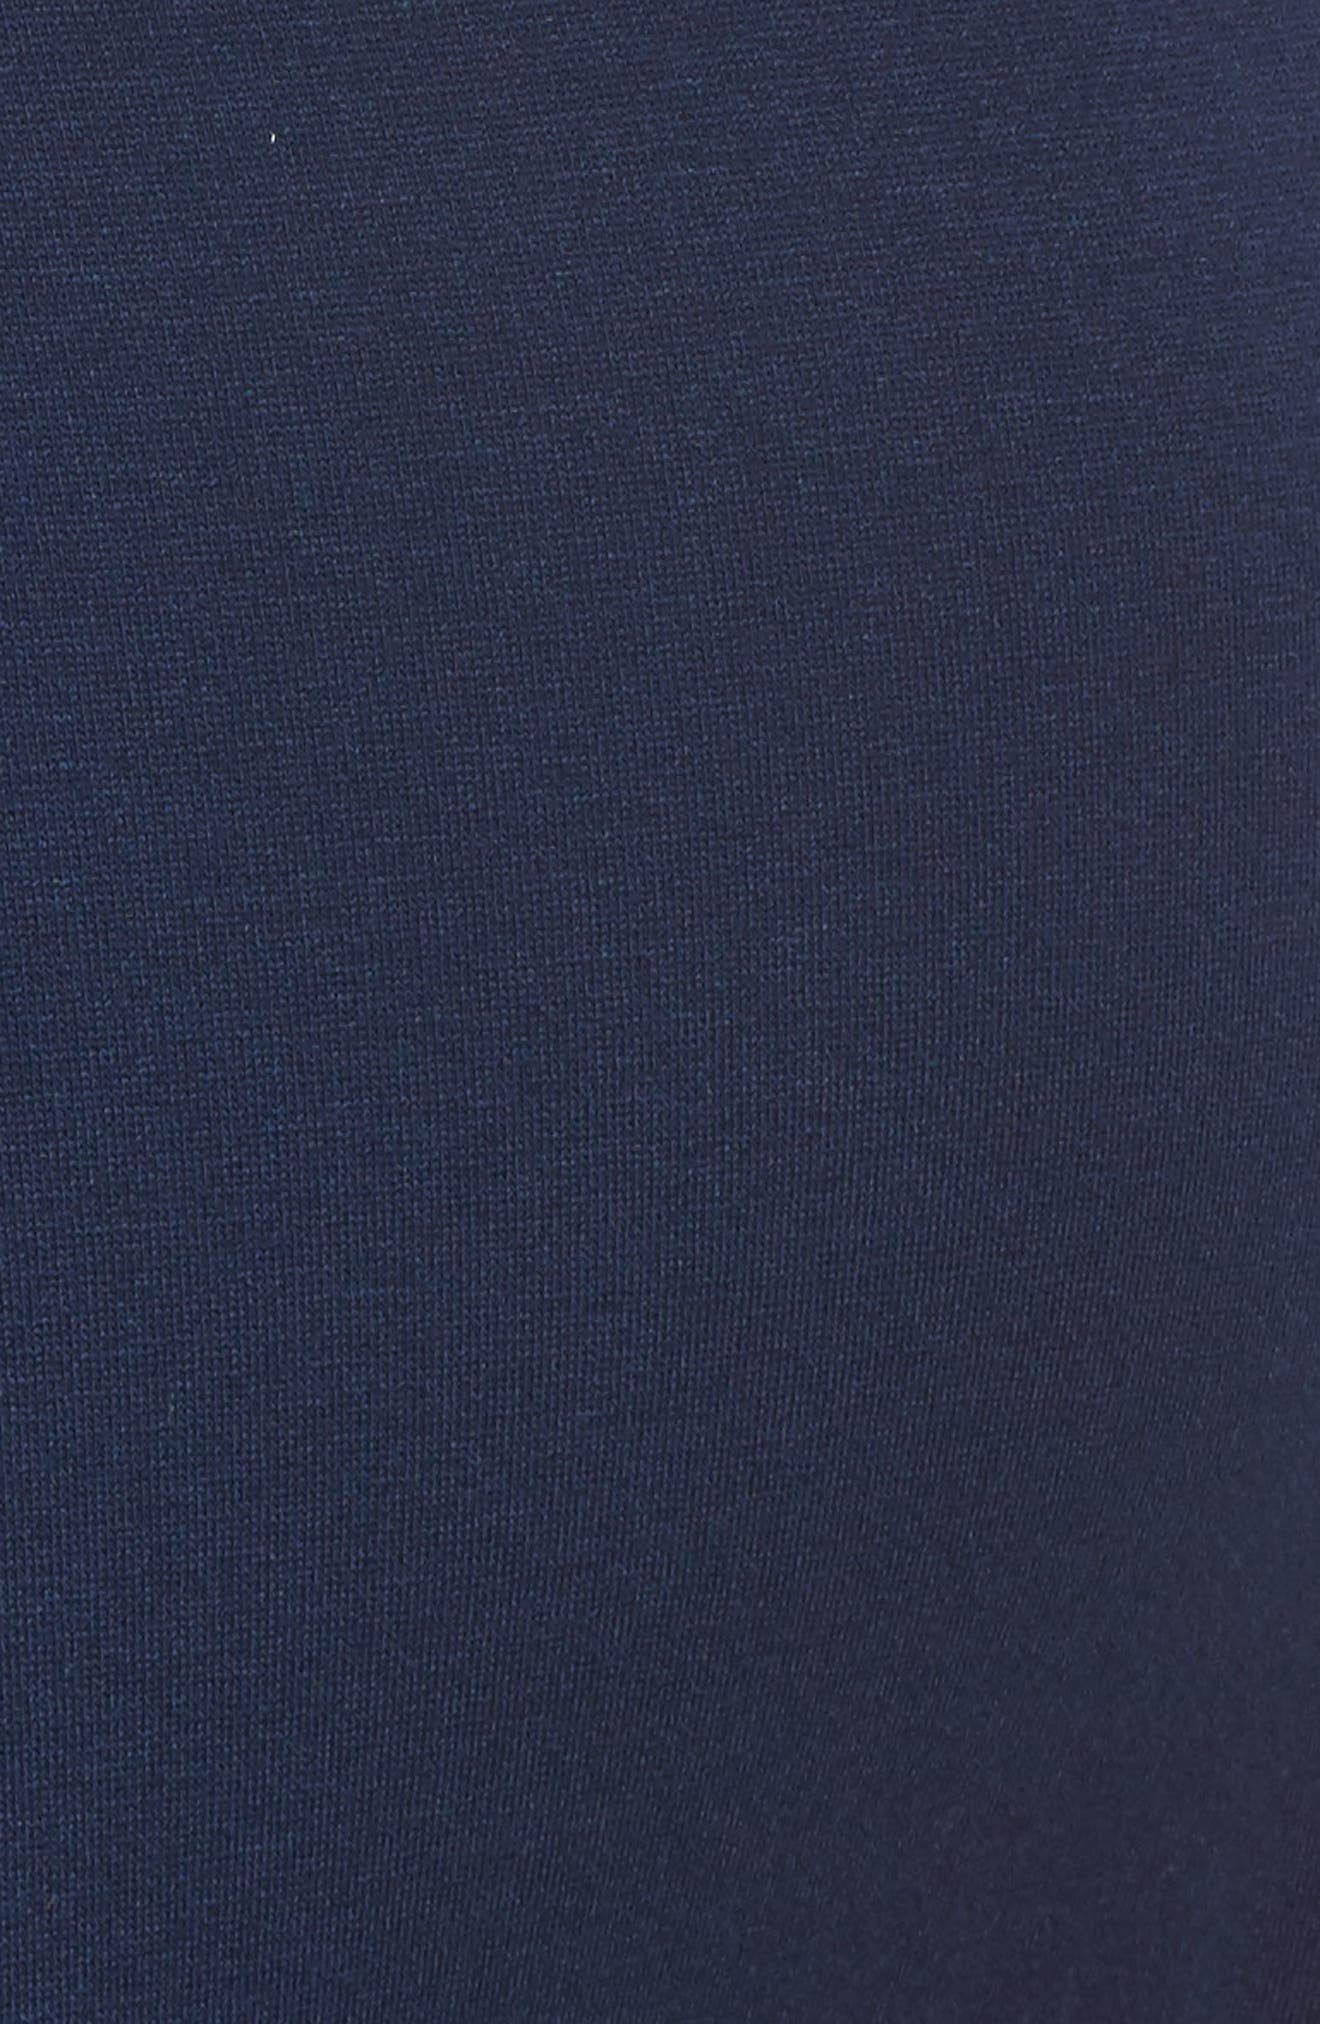 Alternate Image 5  - Belabumbum 'Tallulah' Maternity Jersey Robe